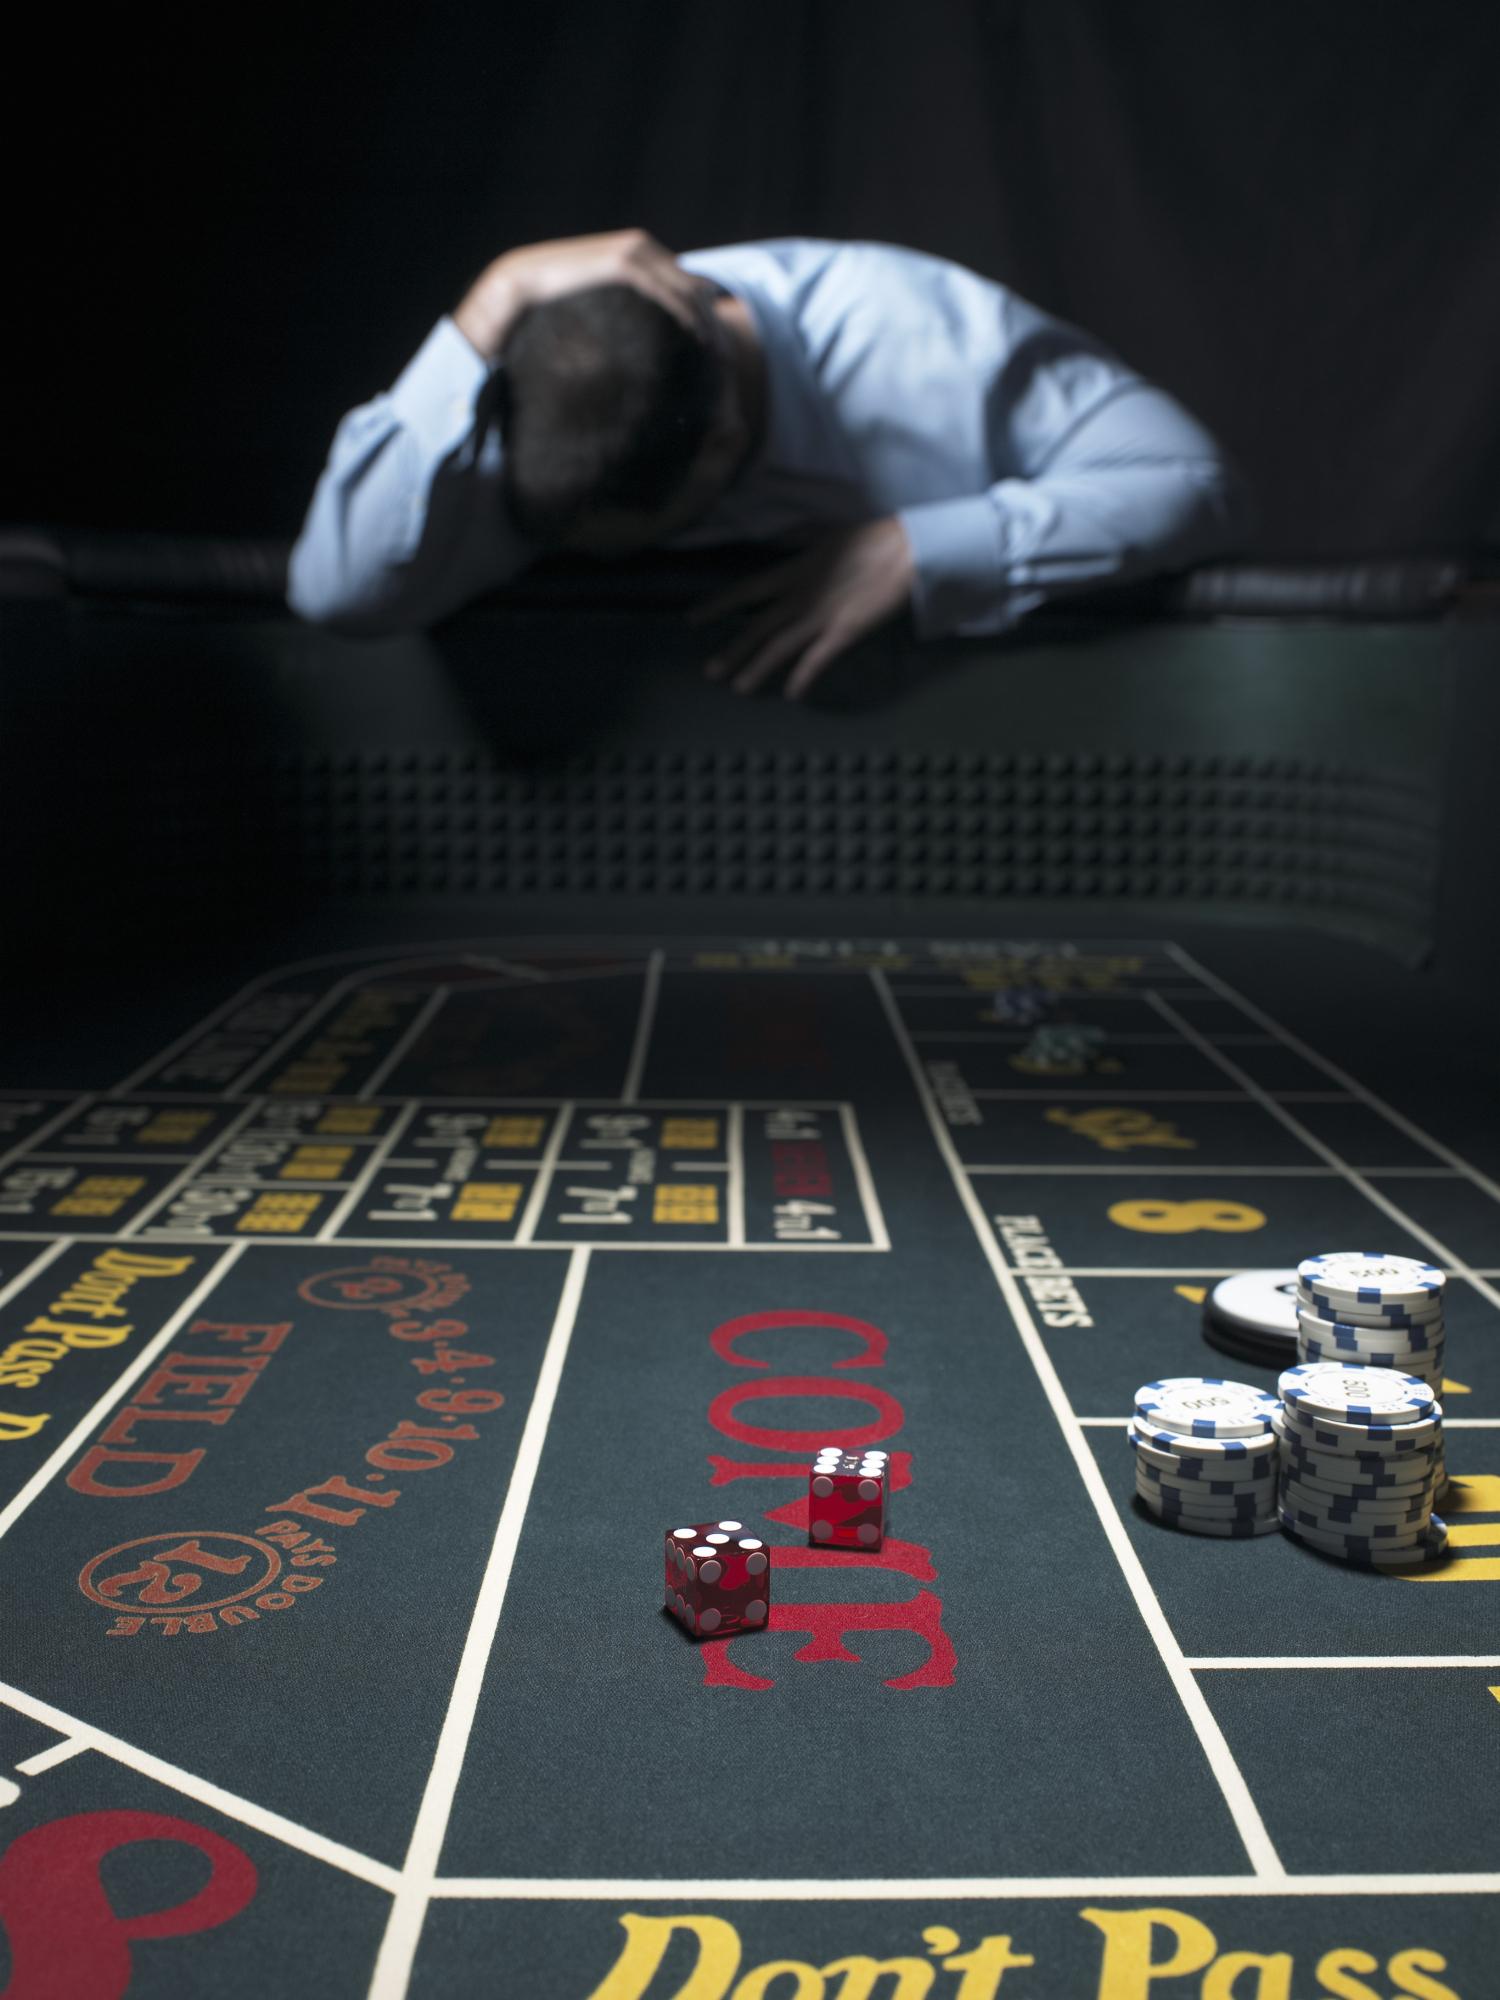 Legal advice husband gambling casino 21